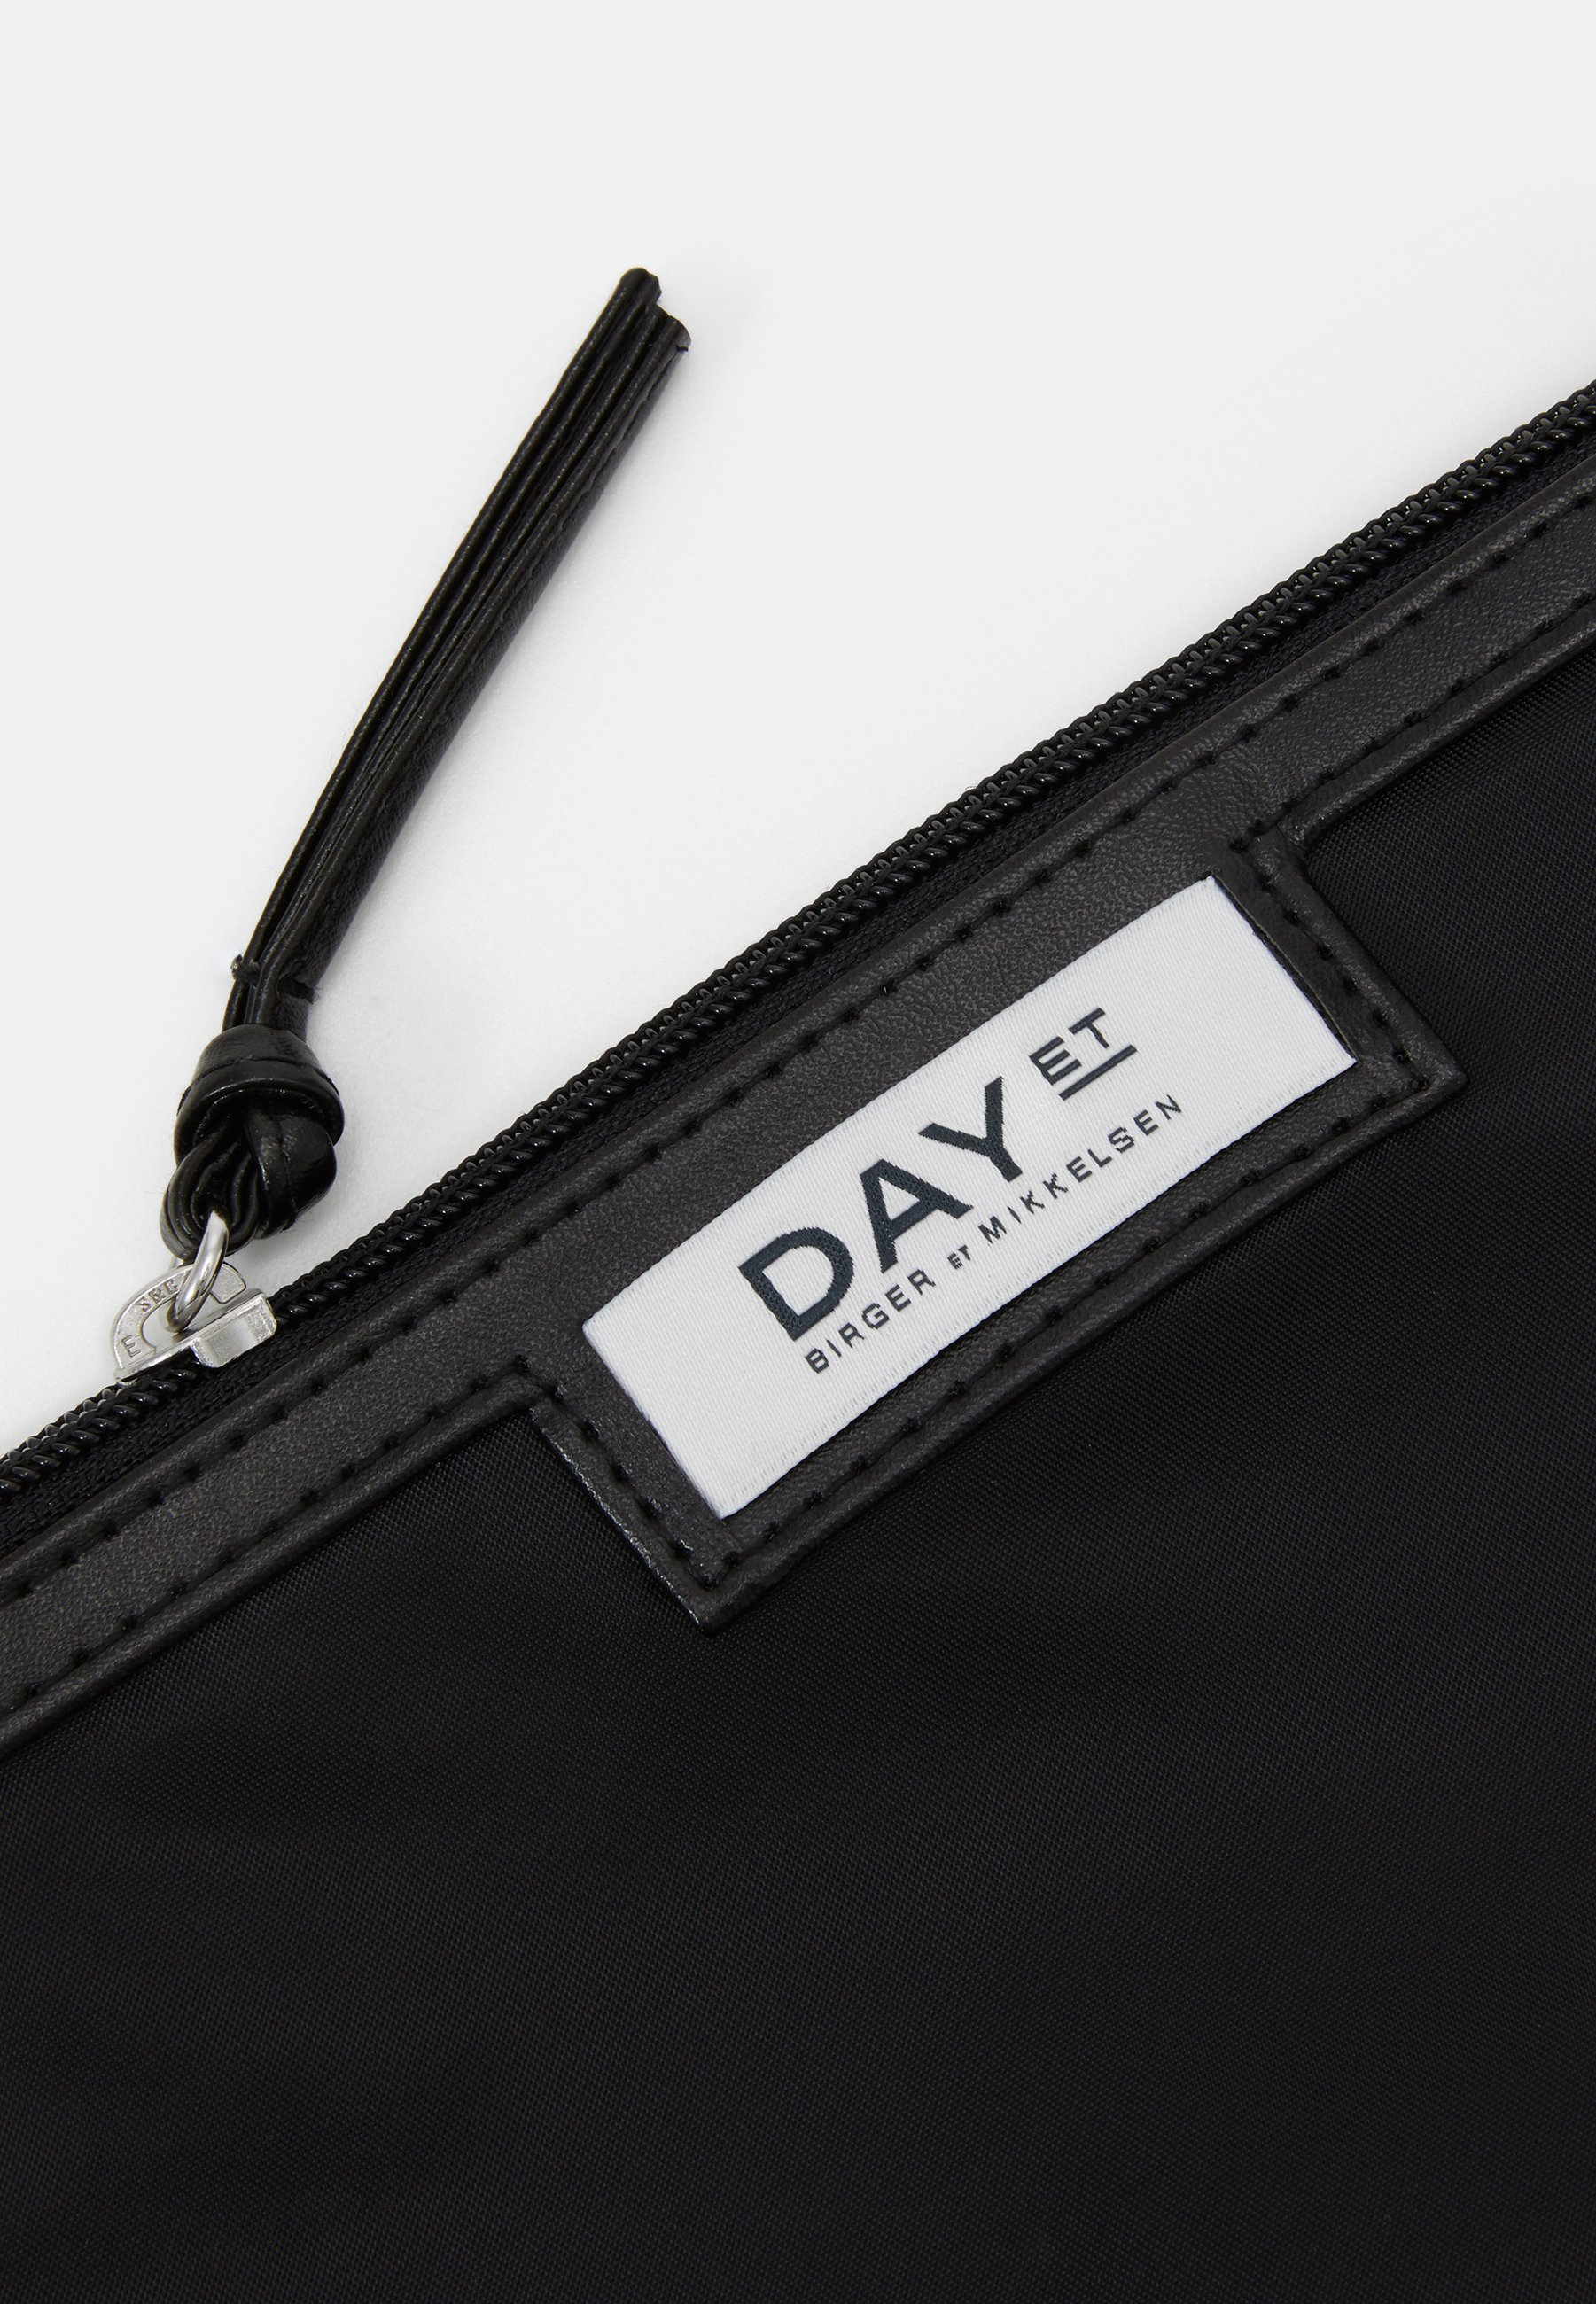 DAY ET GWENETH MINI - Toalettmappe - black/svart OnmcJ9P9oR30R2C